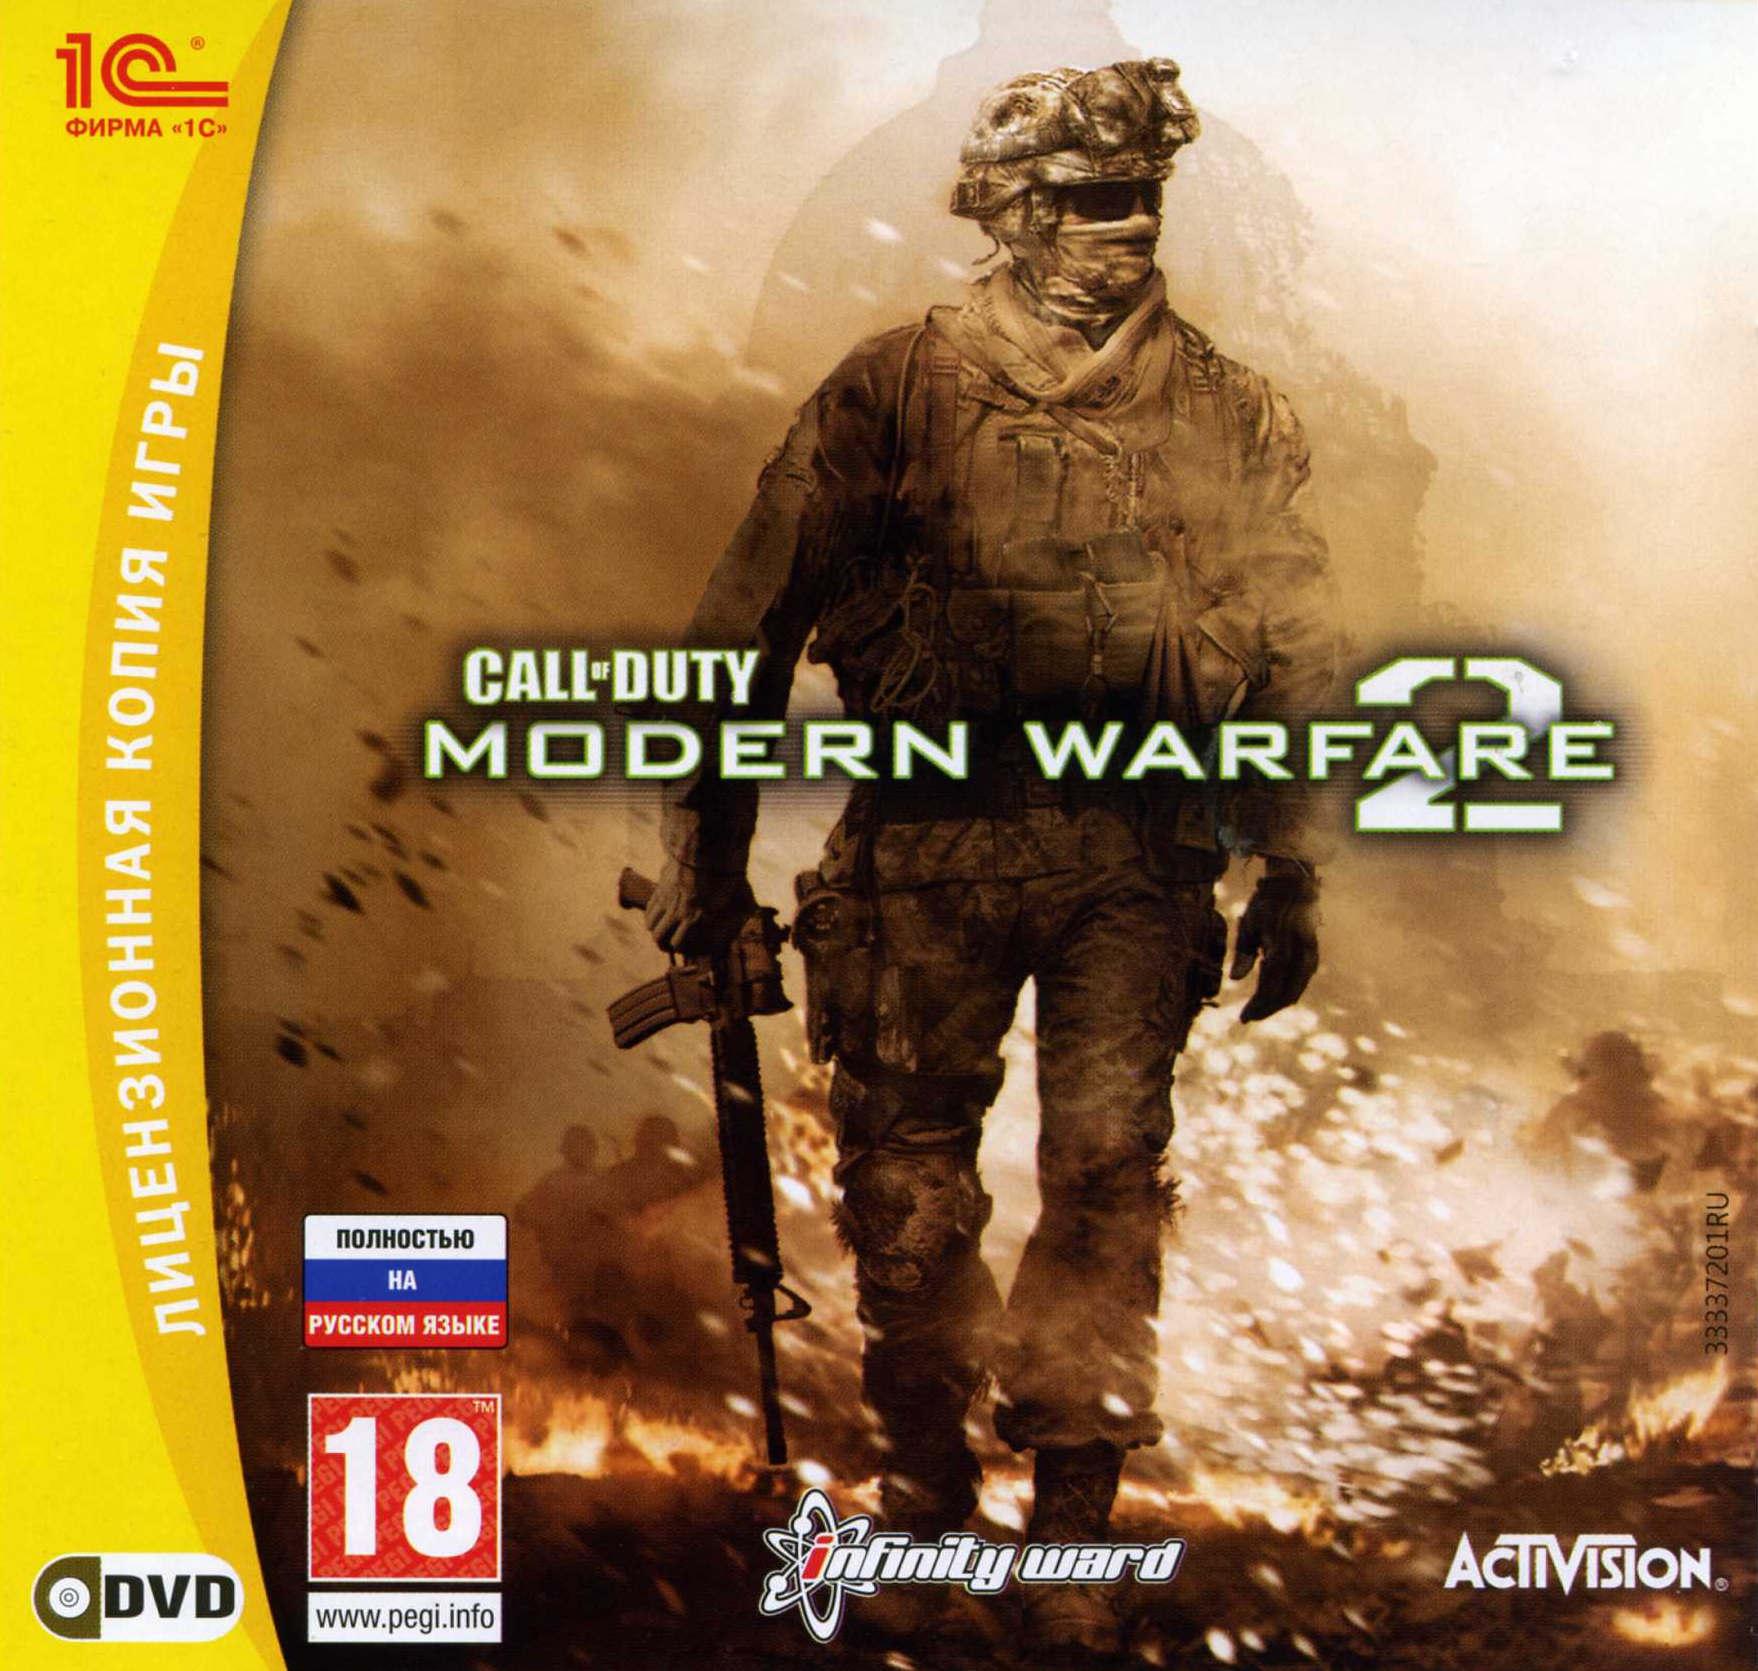 Купить ключ для игры call of duty: modern warfare 2 для steam